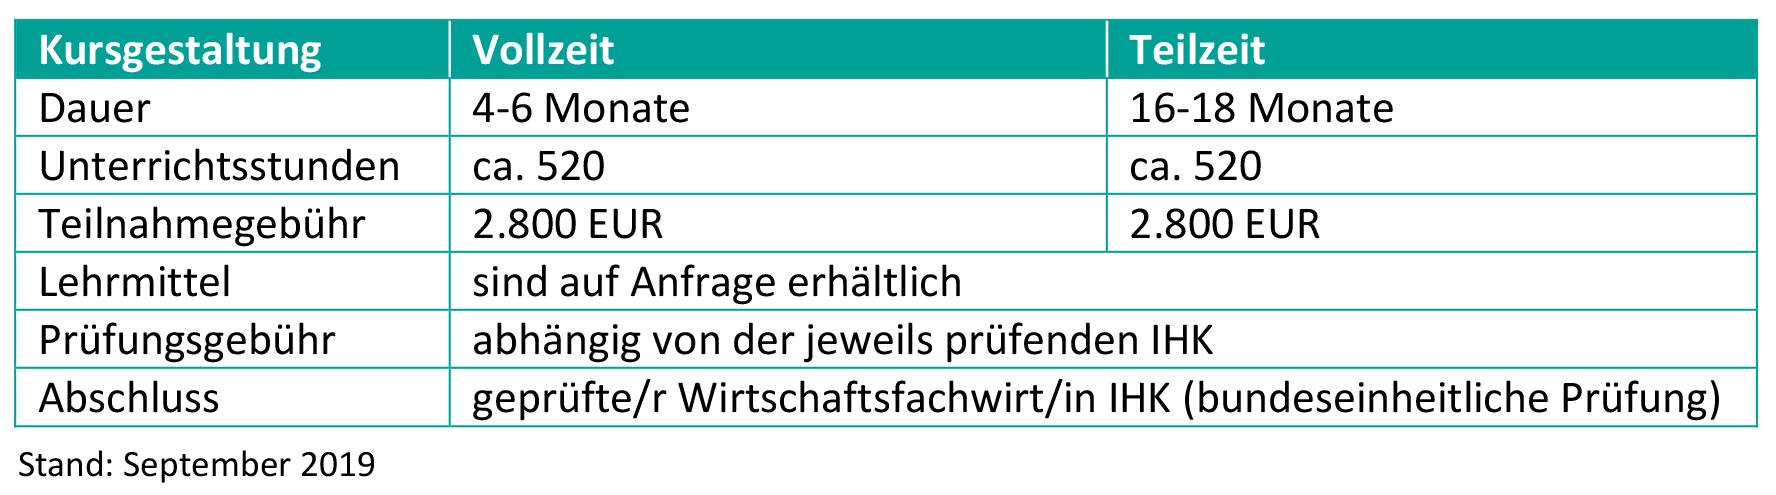 HFW-Eckert-Schulen-Tabelle